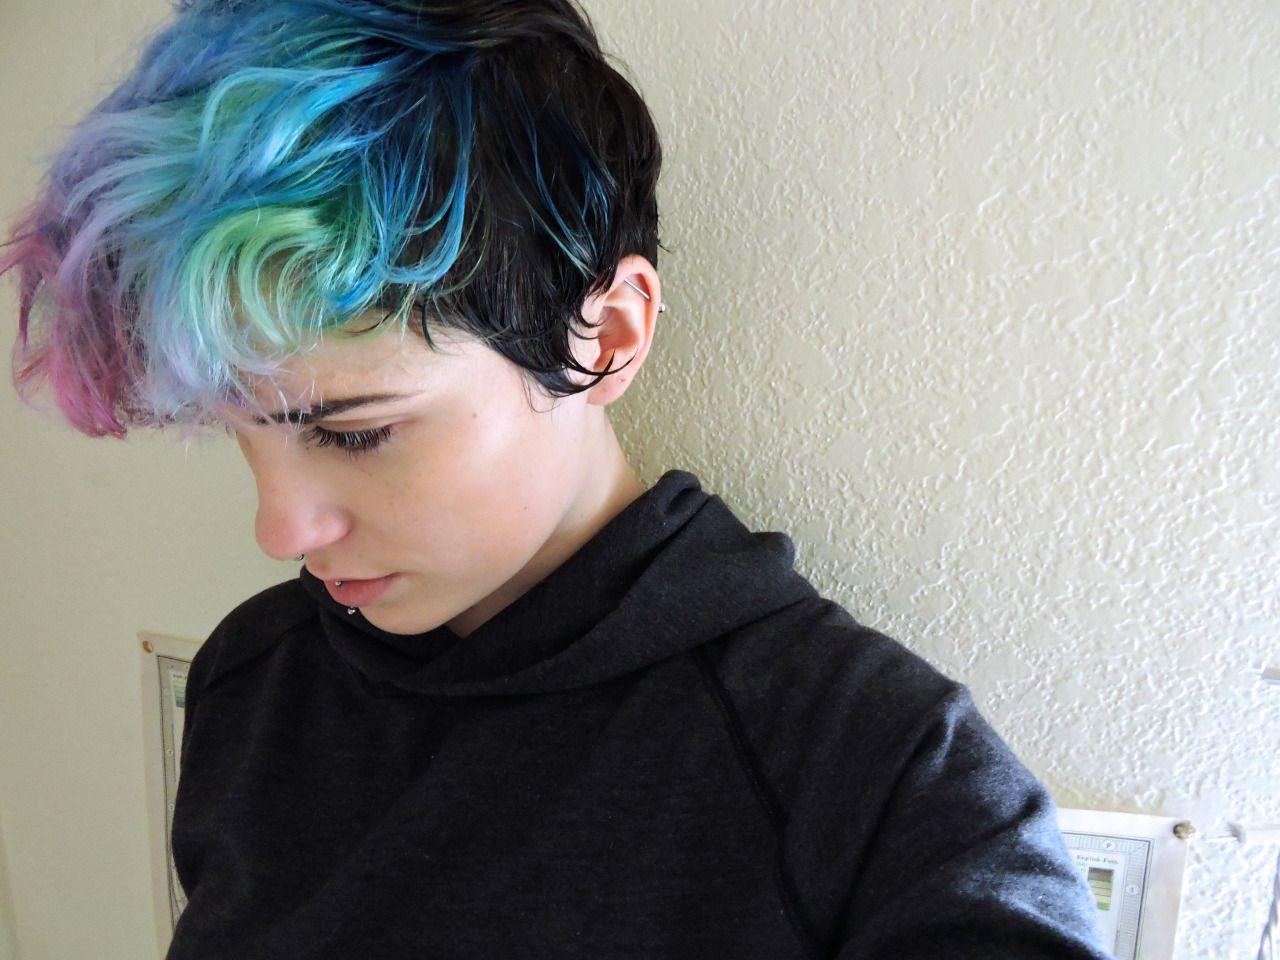 Hair hair color hair dye poop androgynous puff poof andro pale waif